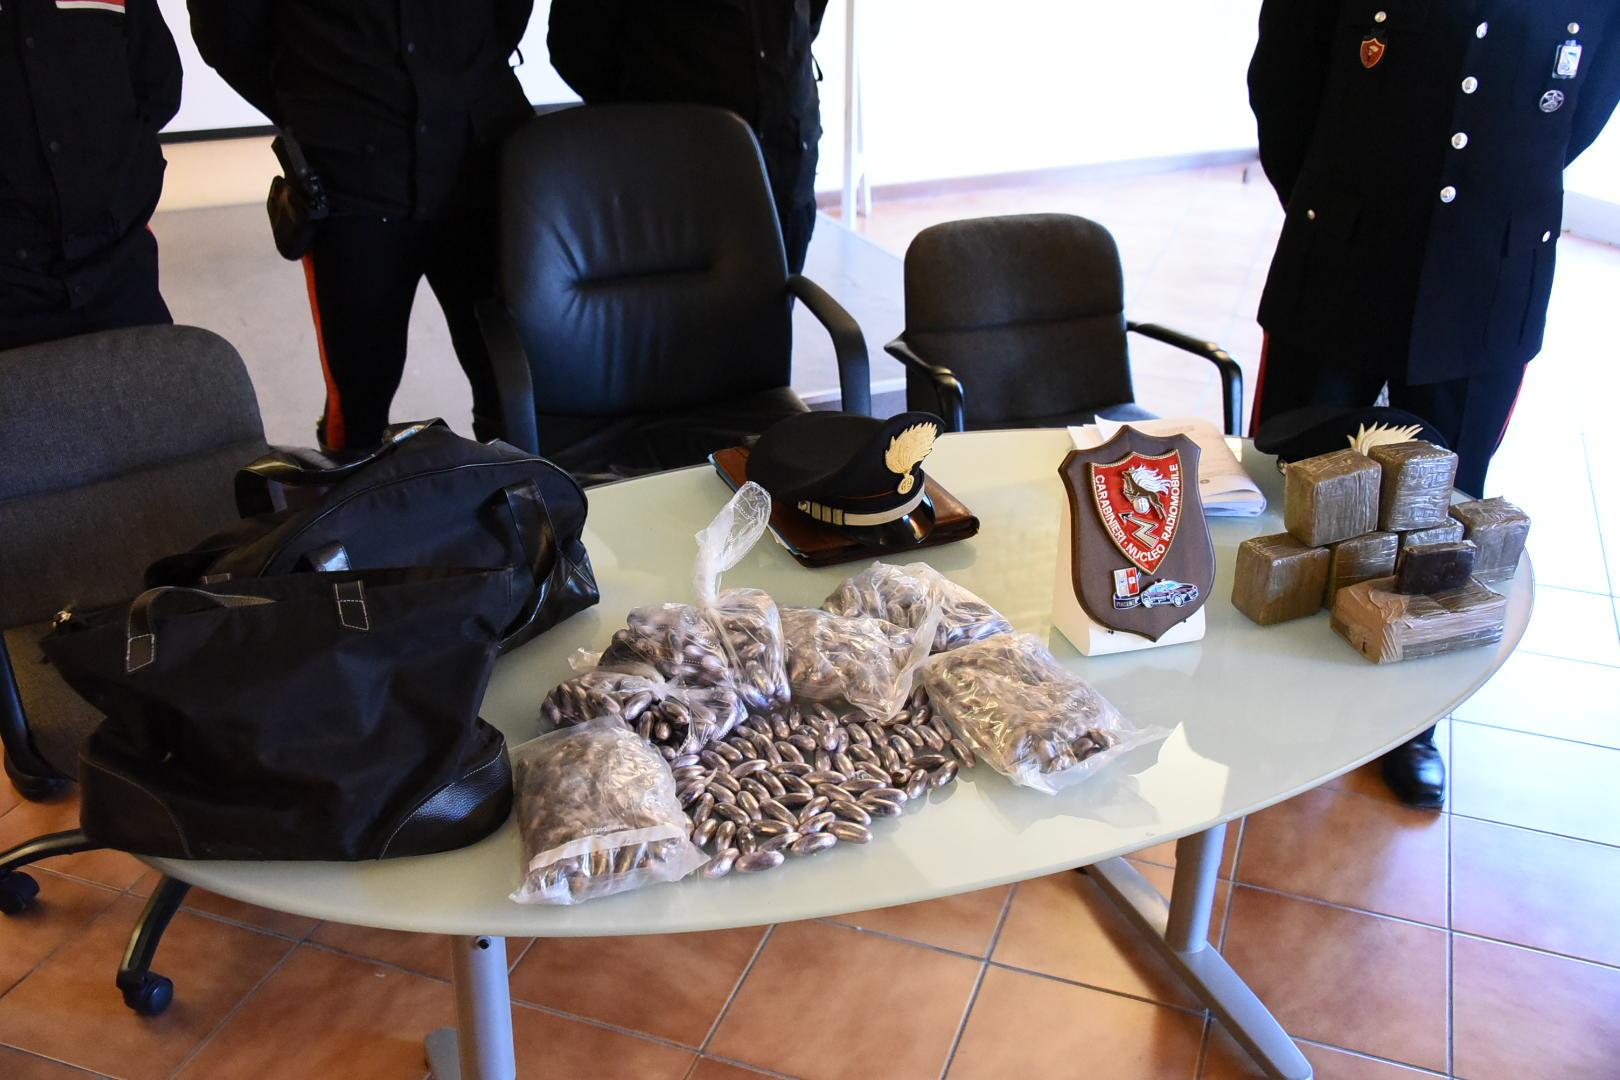 Torre Annunziata, 500 Kg di hashish sequestrati dai Carabinieri: arrestato autotrasportatore